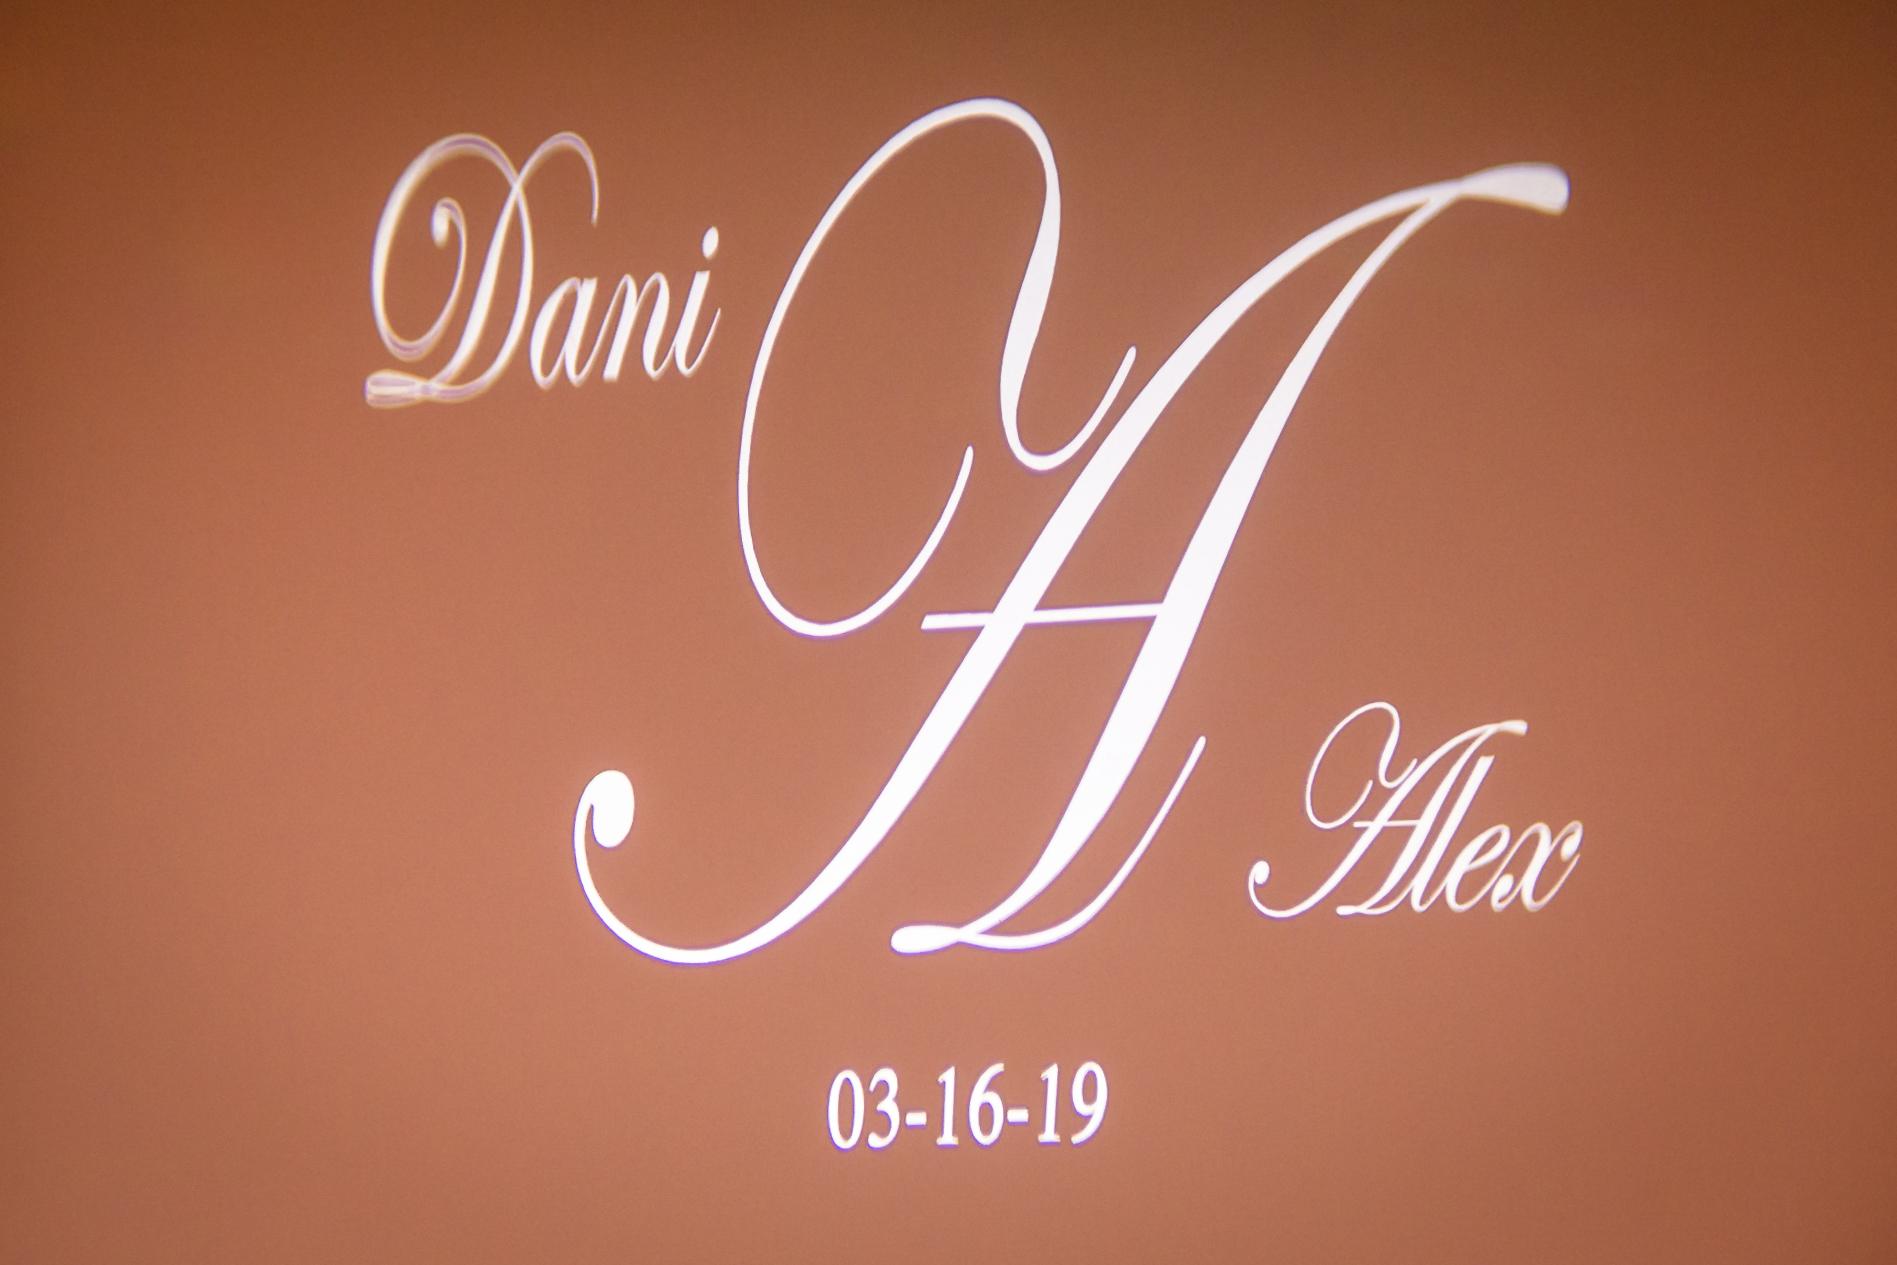 Name in lights lighting design on wall at Nanina's in the Park, Belleville NJ